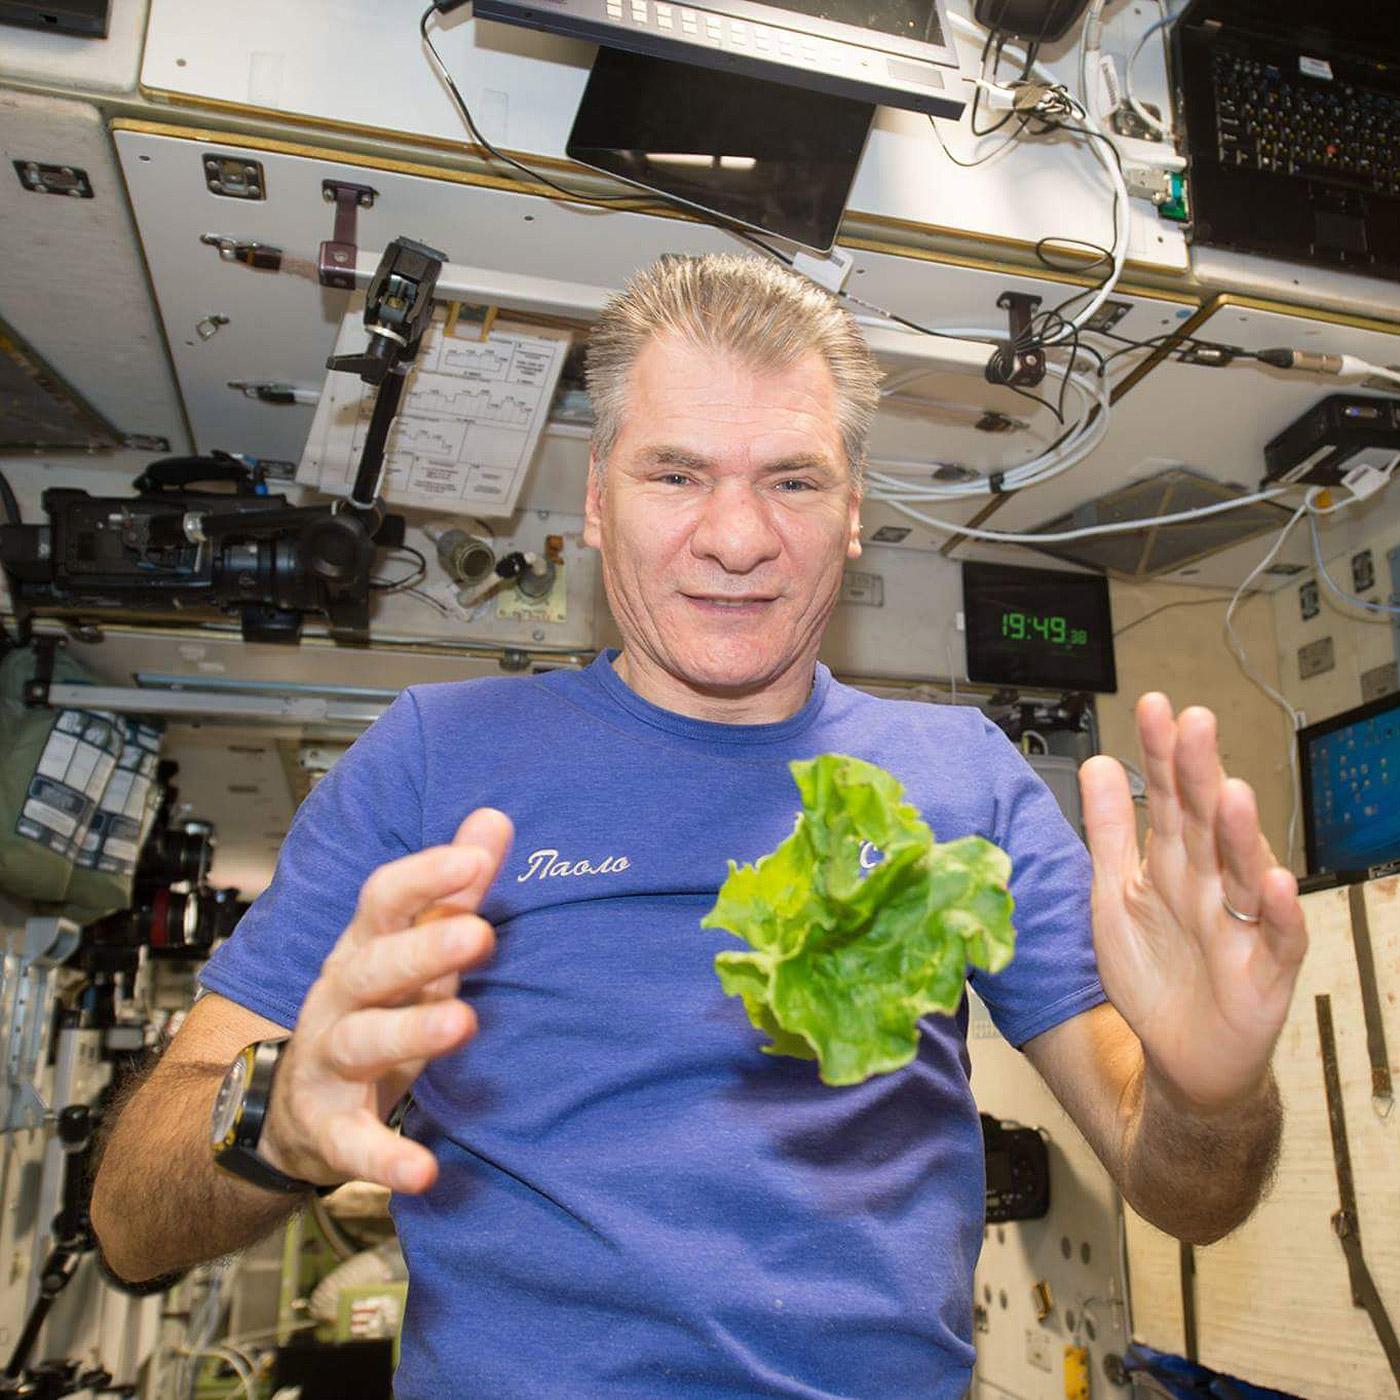 paolo nespoli floating lettuce